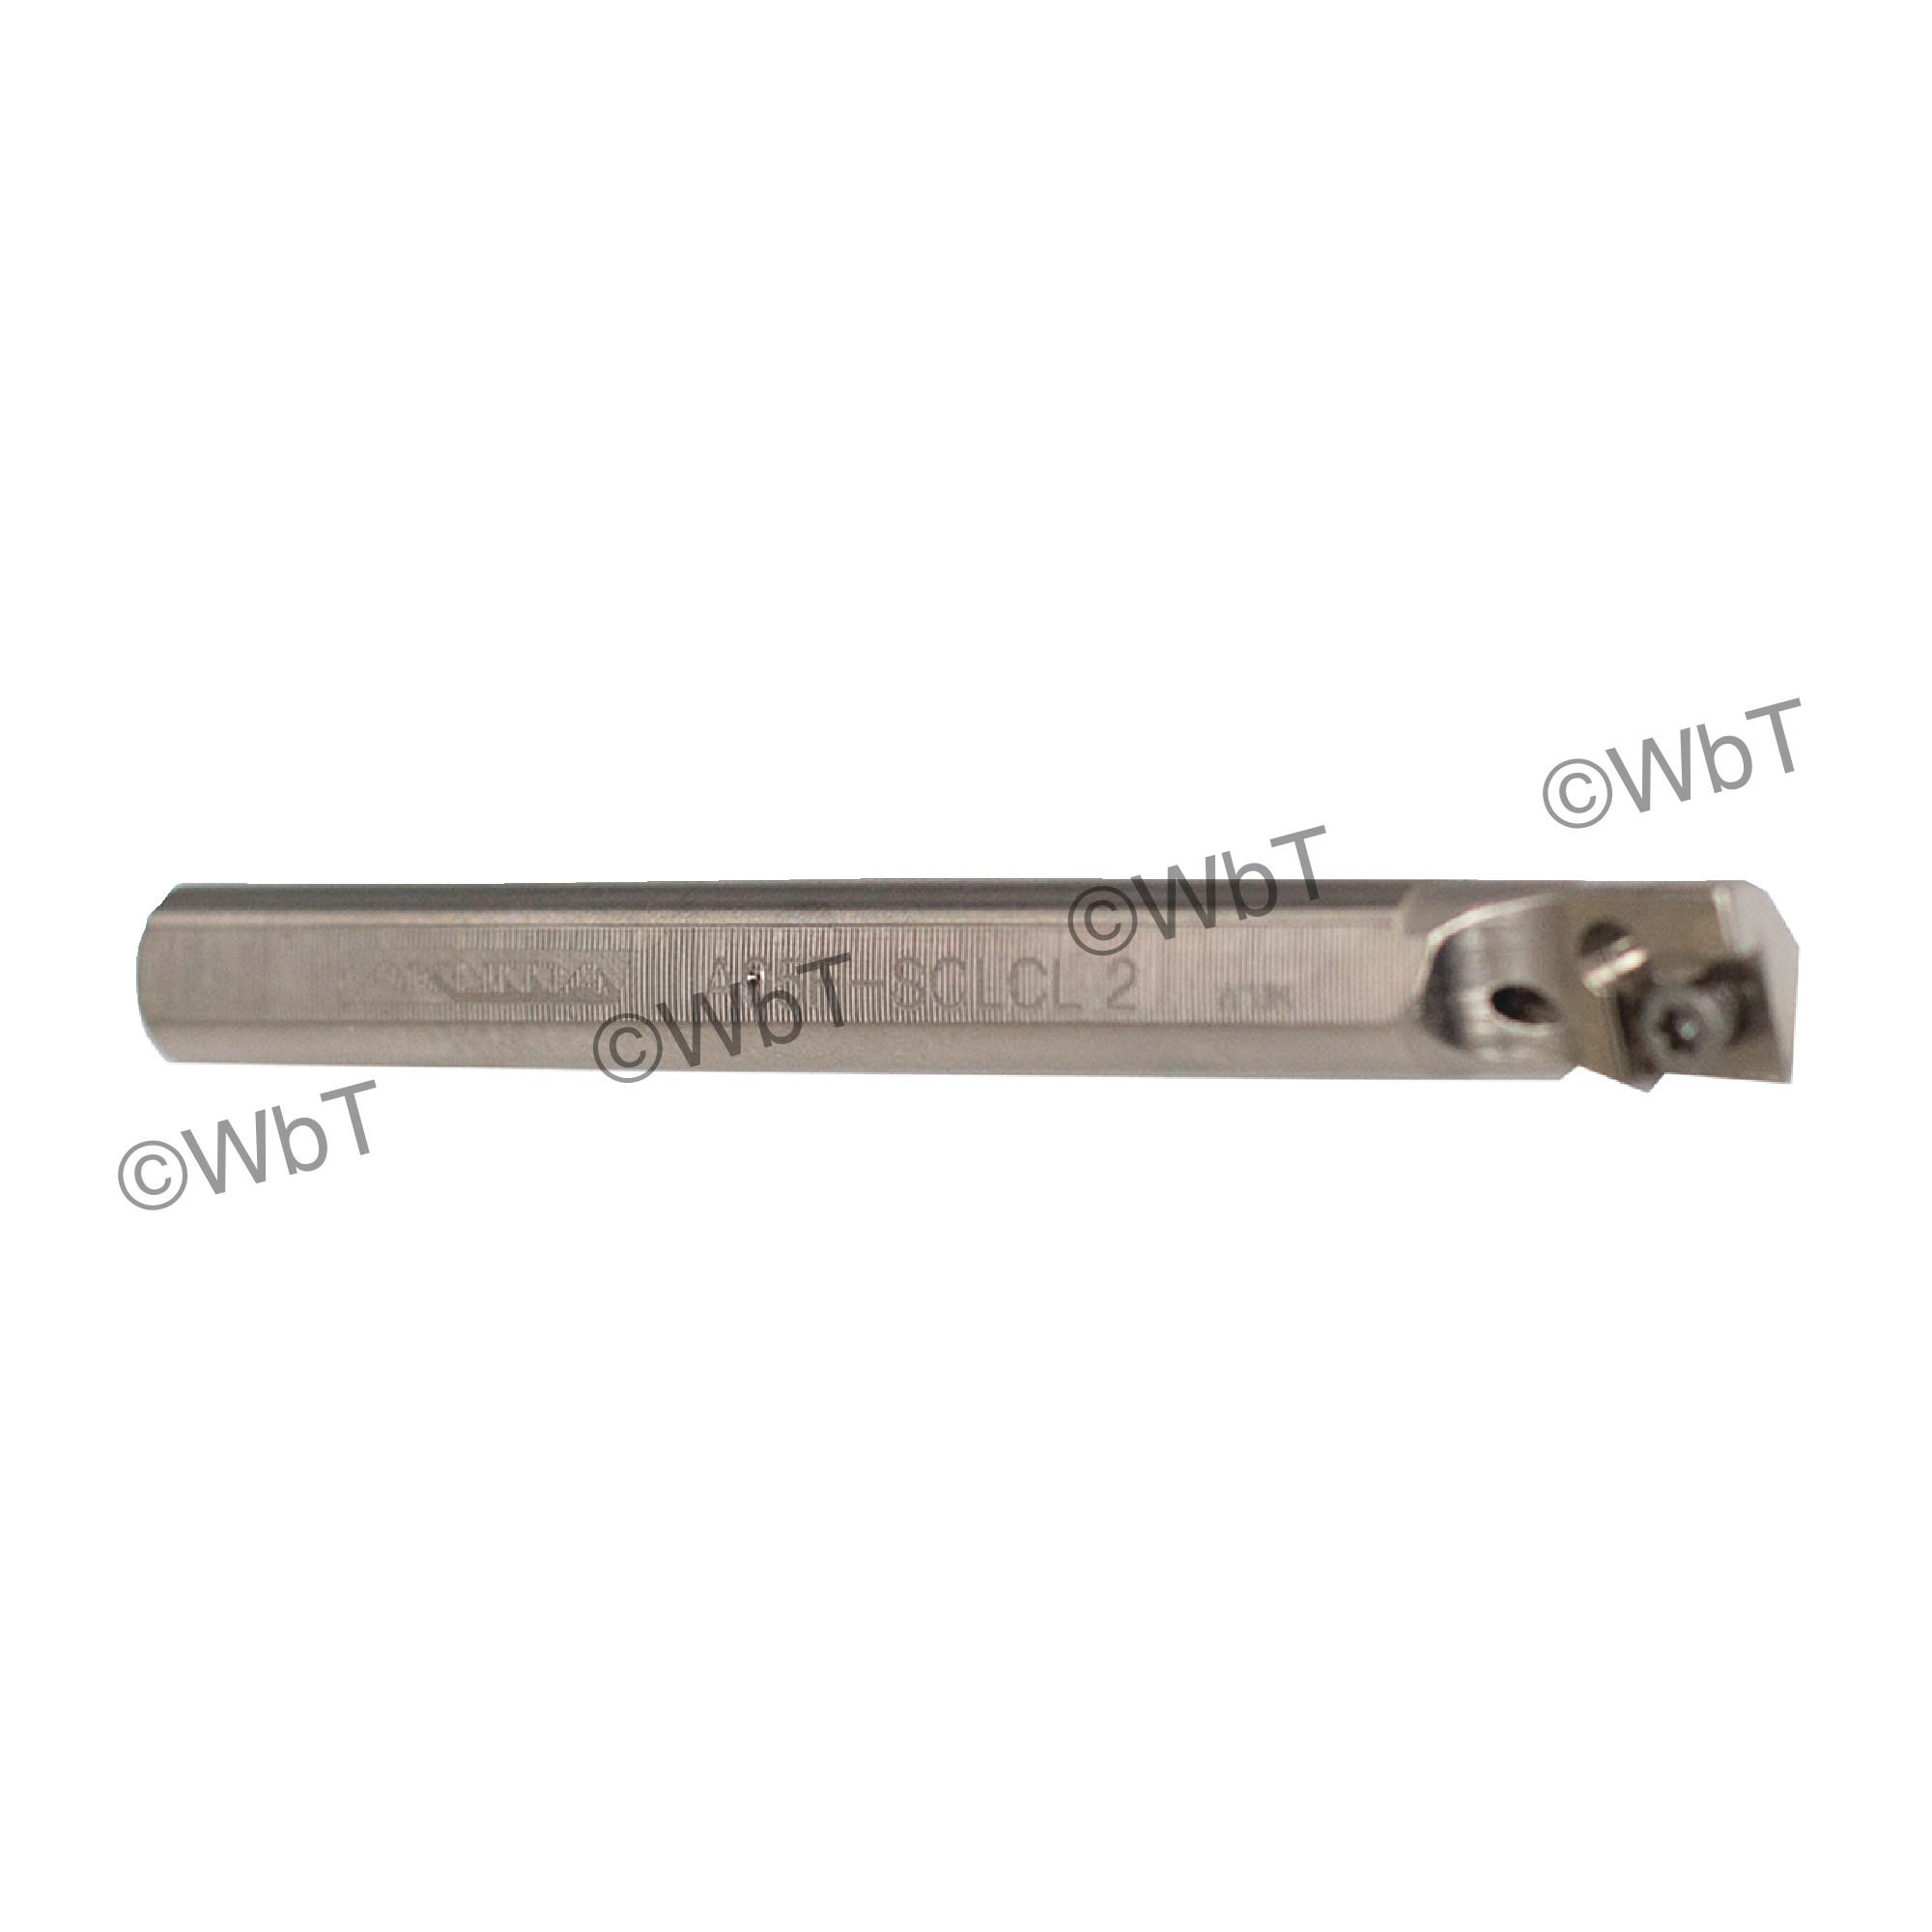 "AKUMA - A05F-SCLCL-2 / Steel Boring Bar / 5/16"" Shank / CCMT2(1.5)_ / Cooalnt Thru / Left Hand"